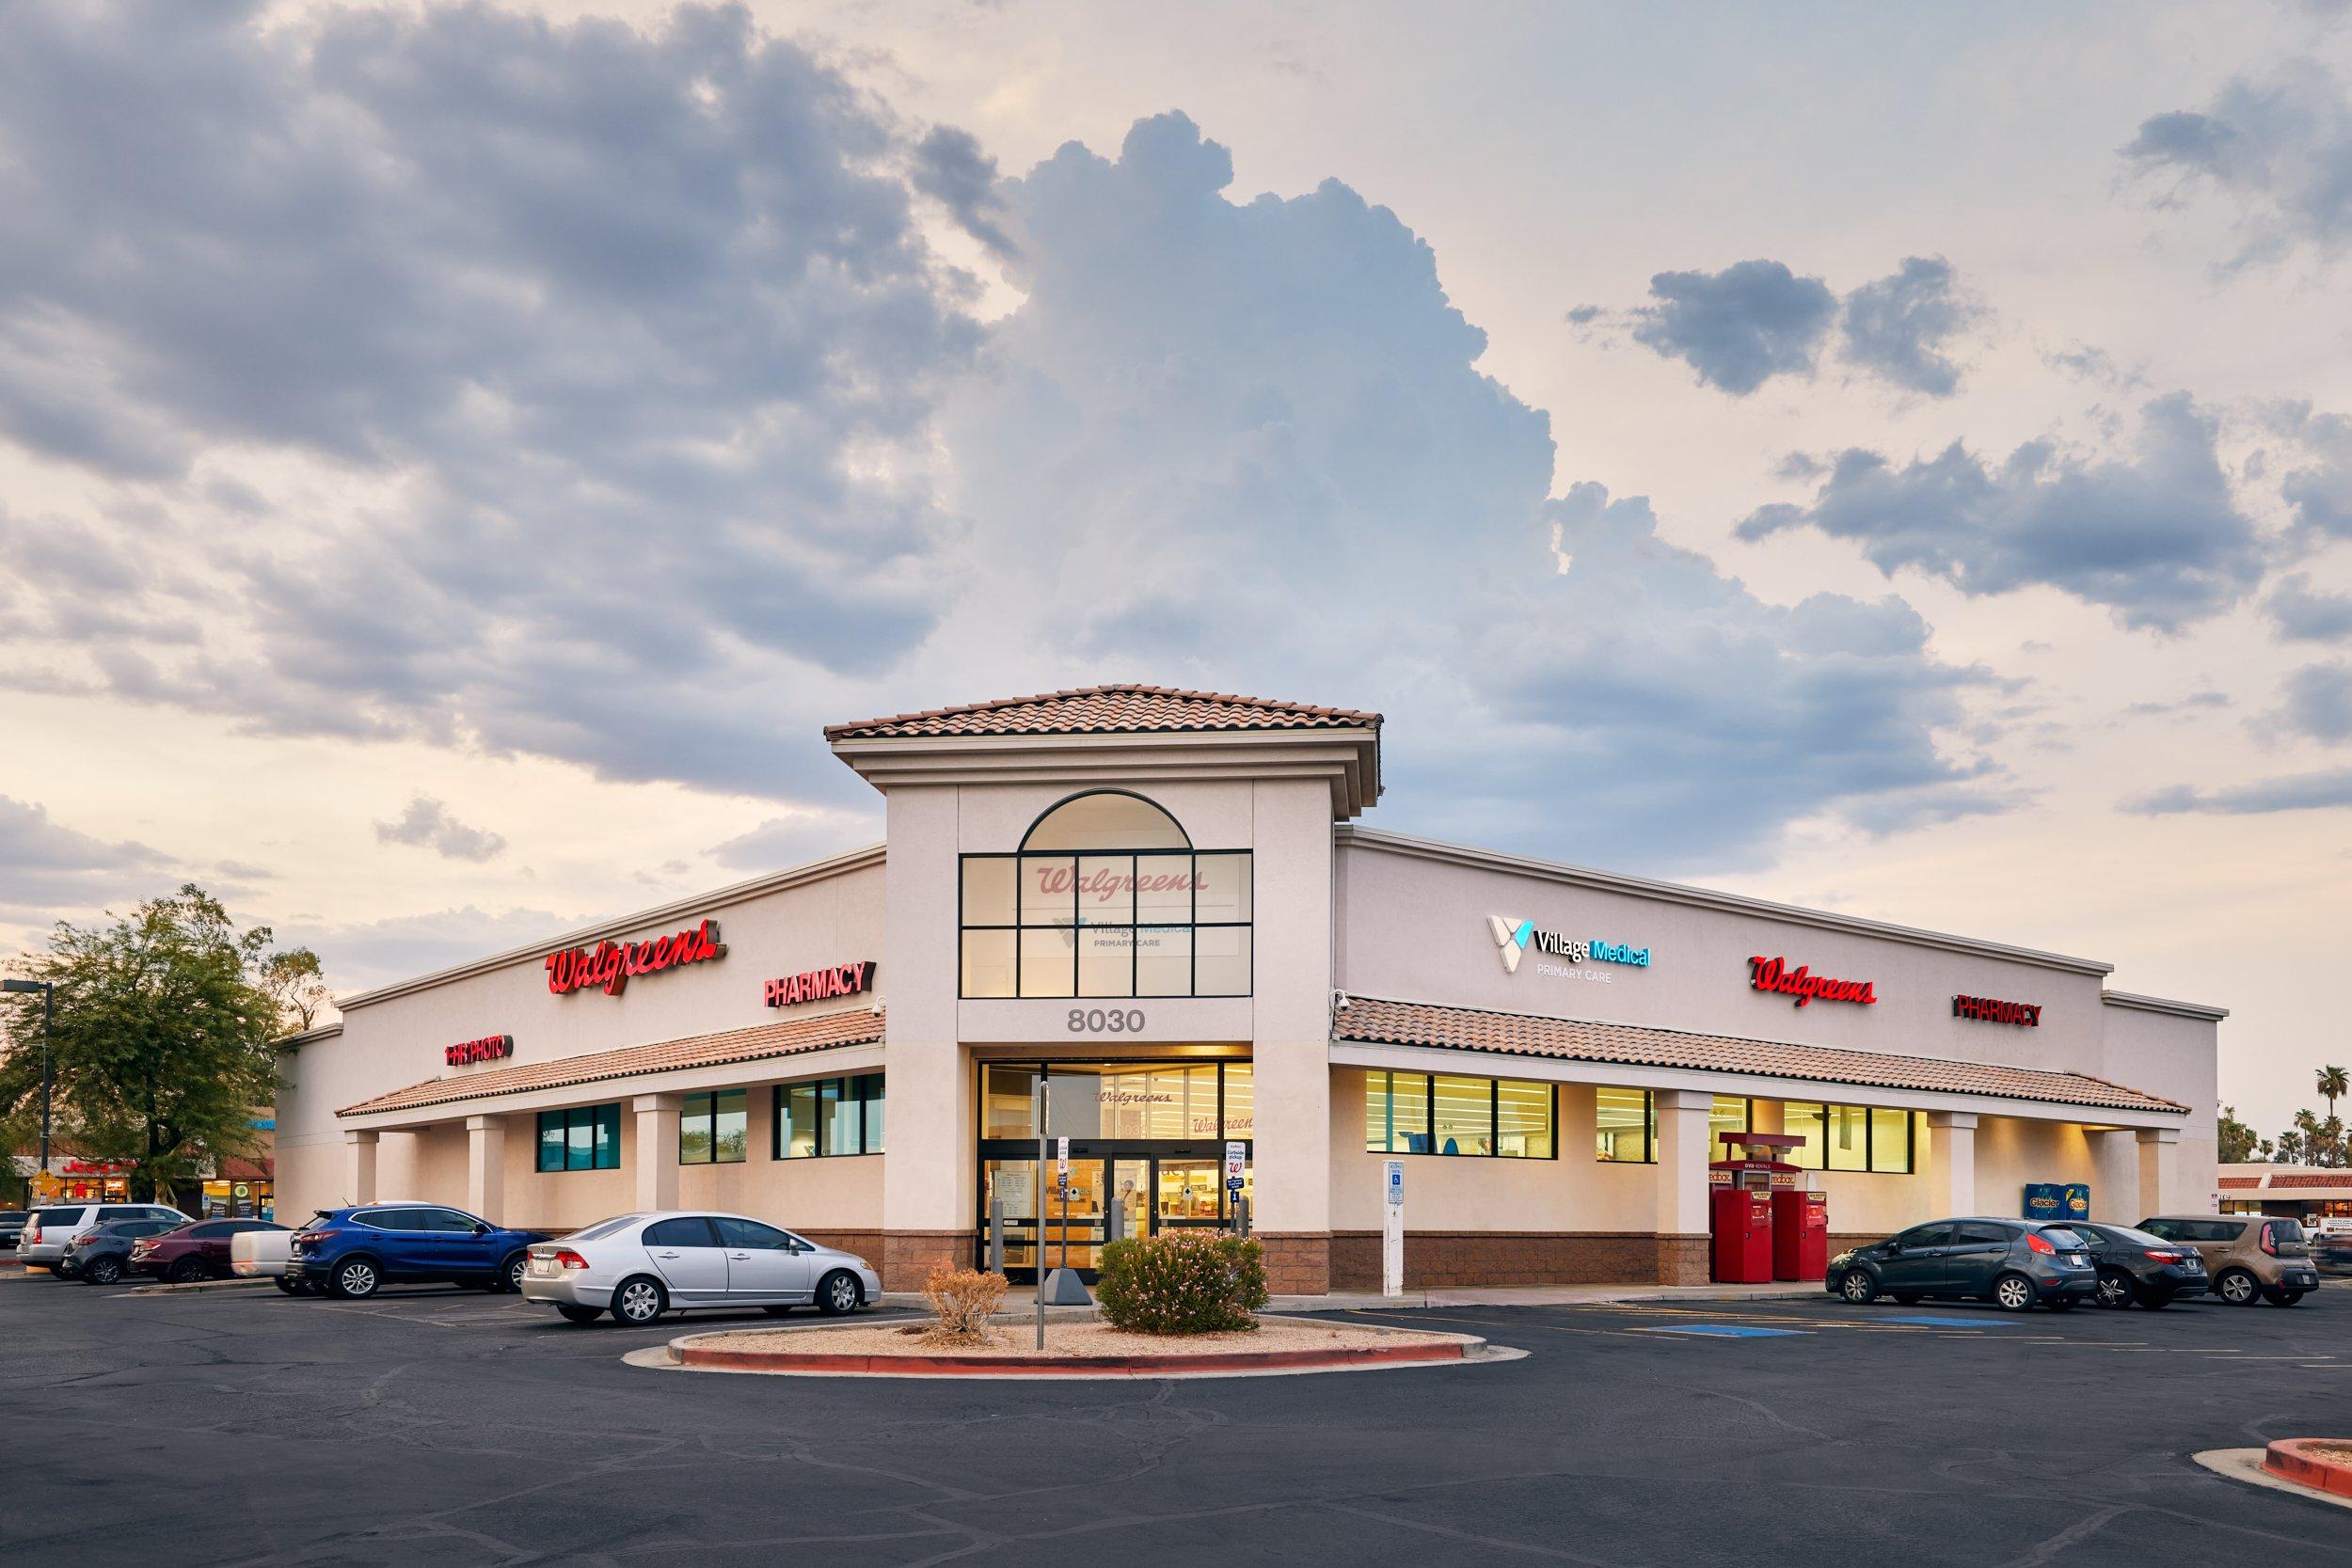 Village Medical at Walgreens - 8032 N. 19th Ave  Phoenix, AZ 85021